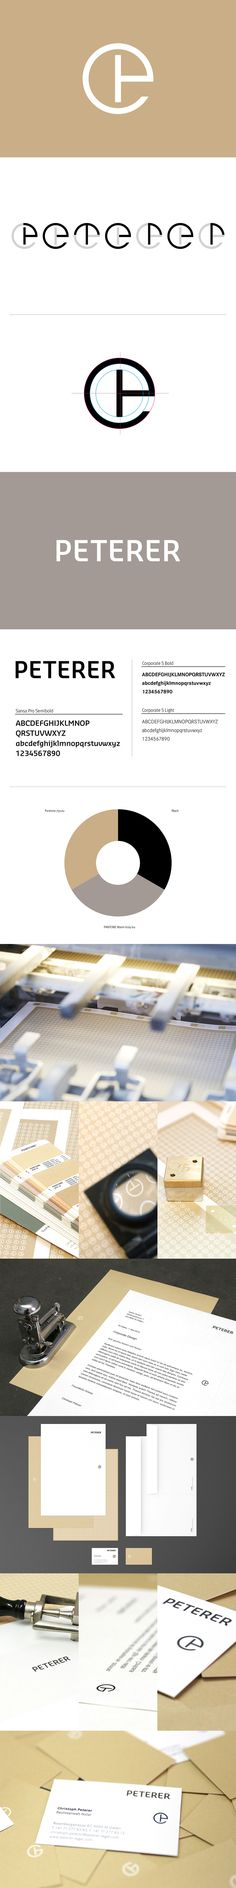 Peterer Lawyer // Corporate Design on Behance